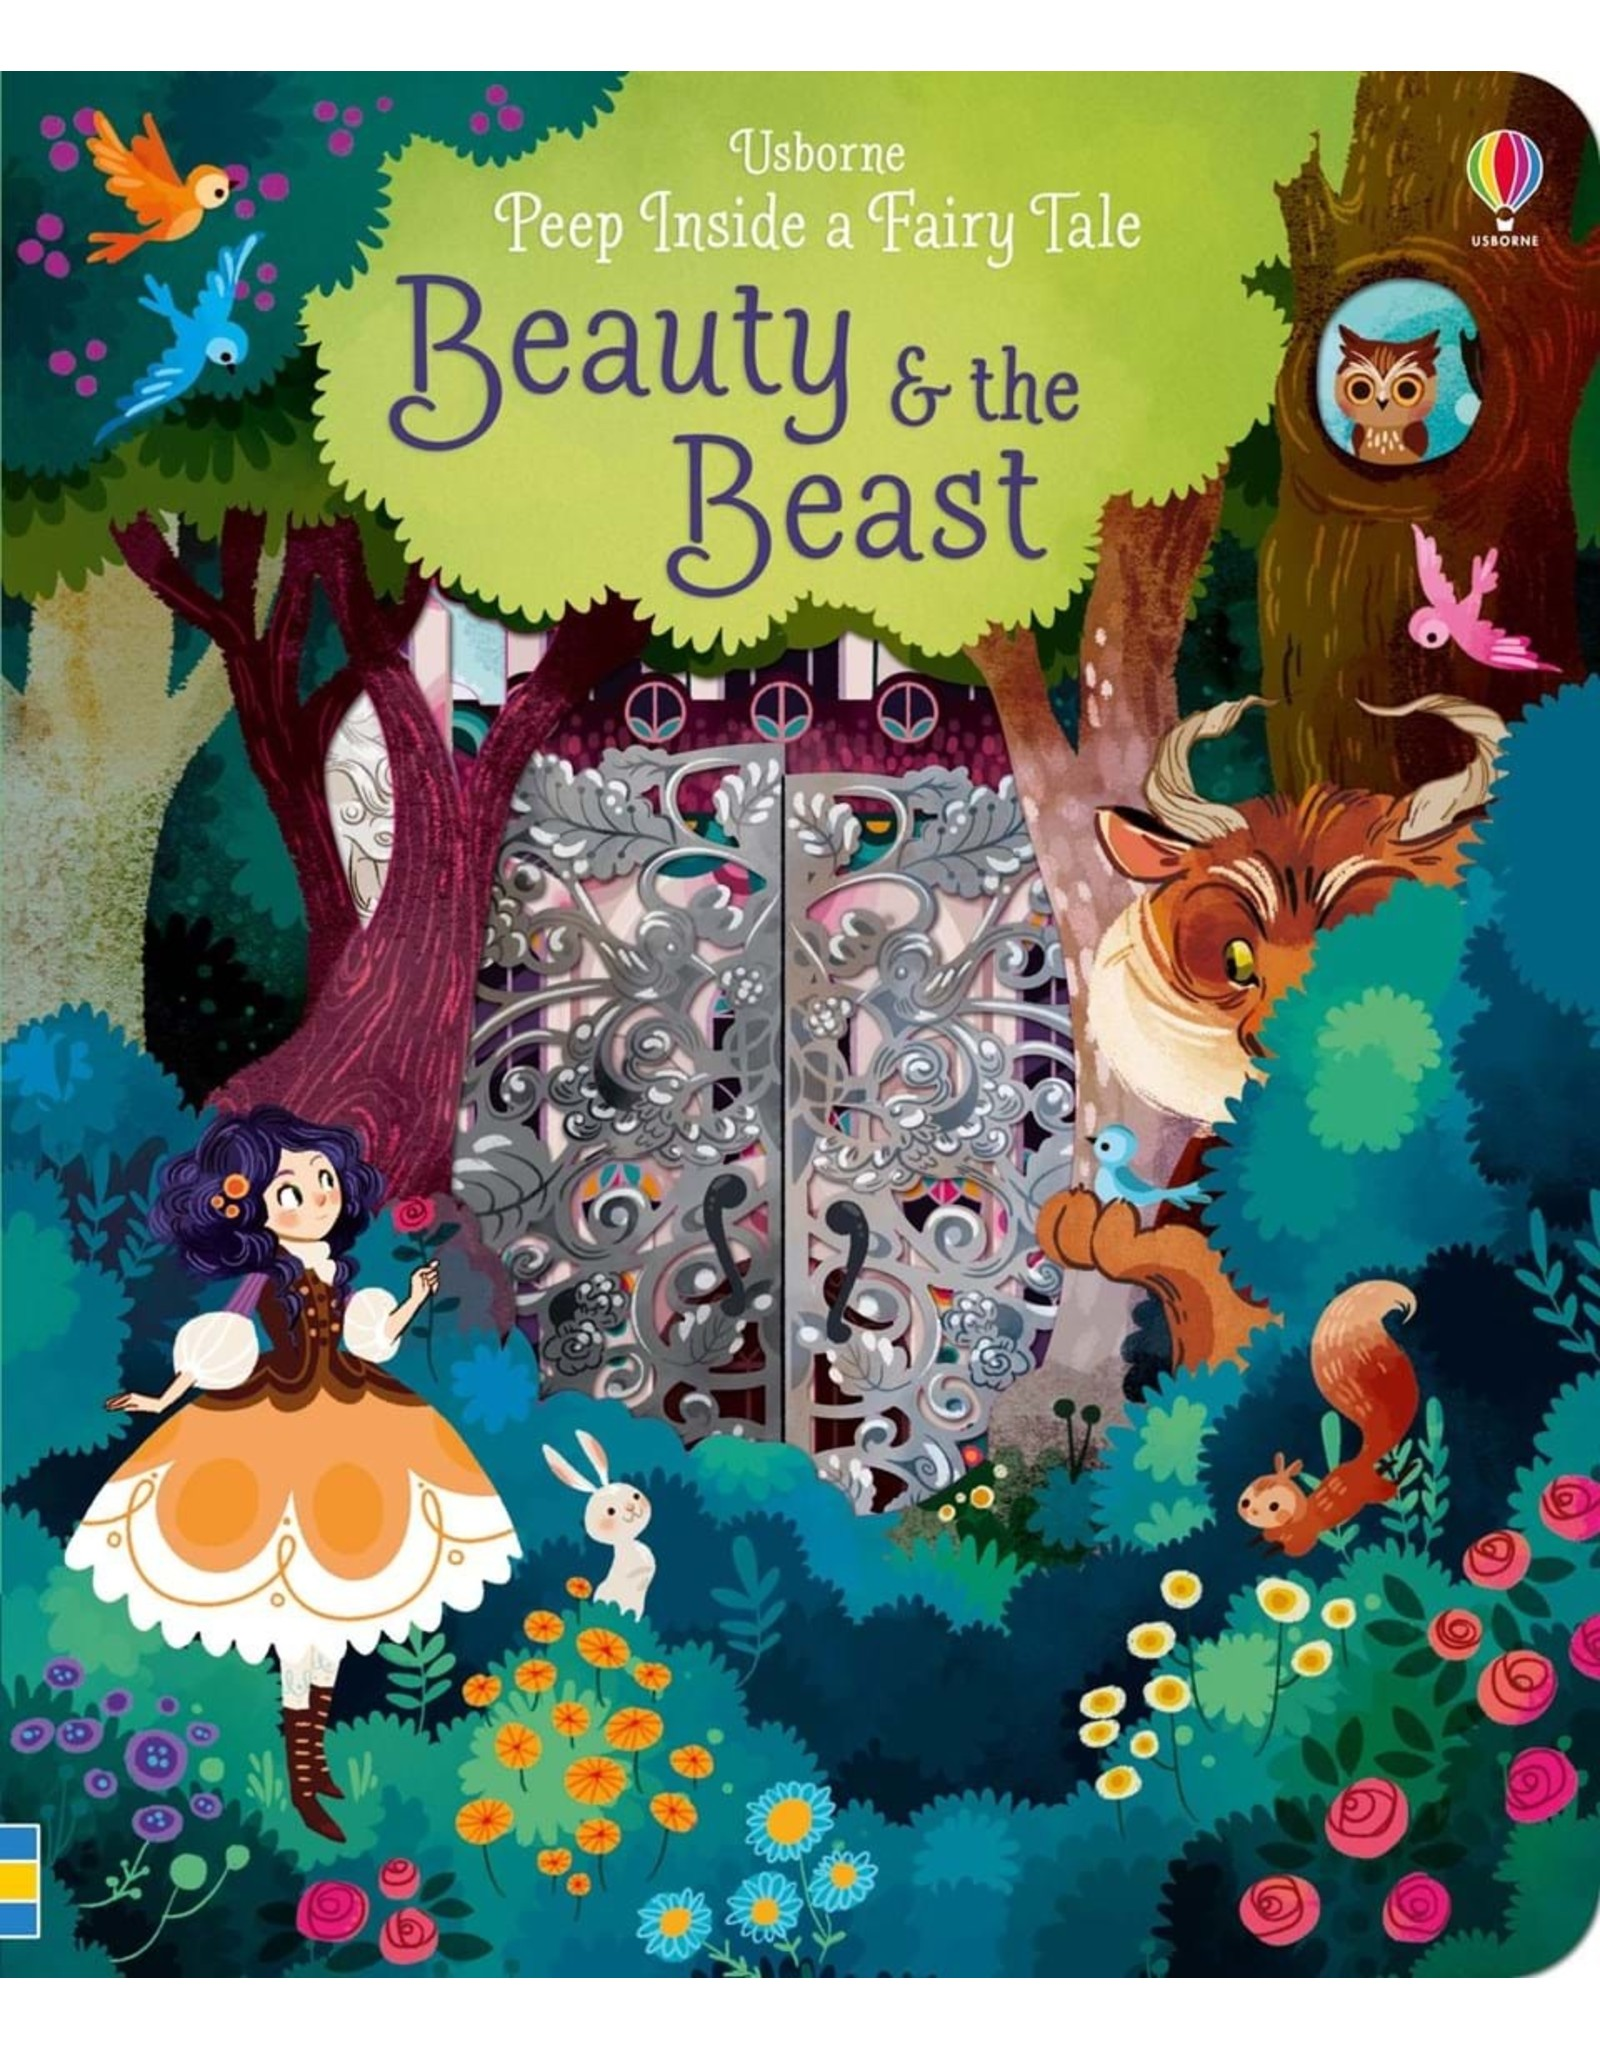 Usborne Peep Inside a Fairy Tale: Beauty and the Beast